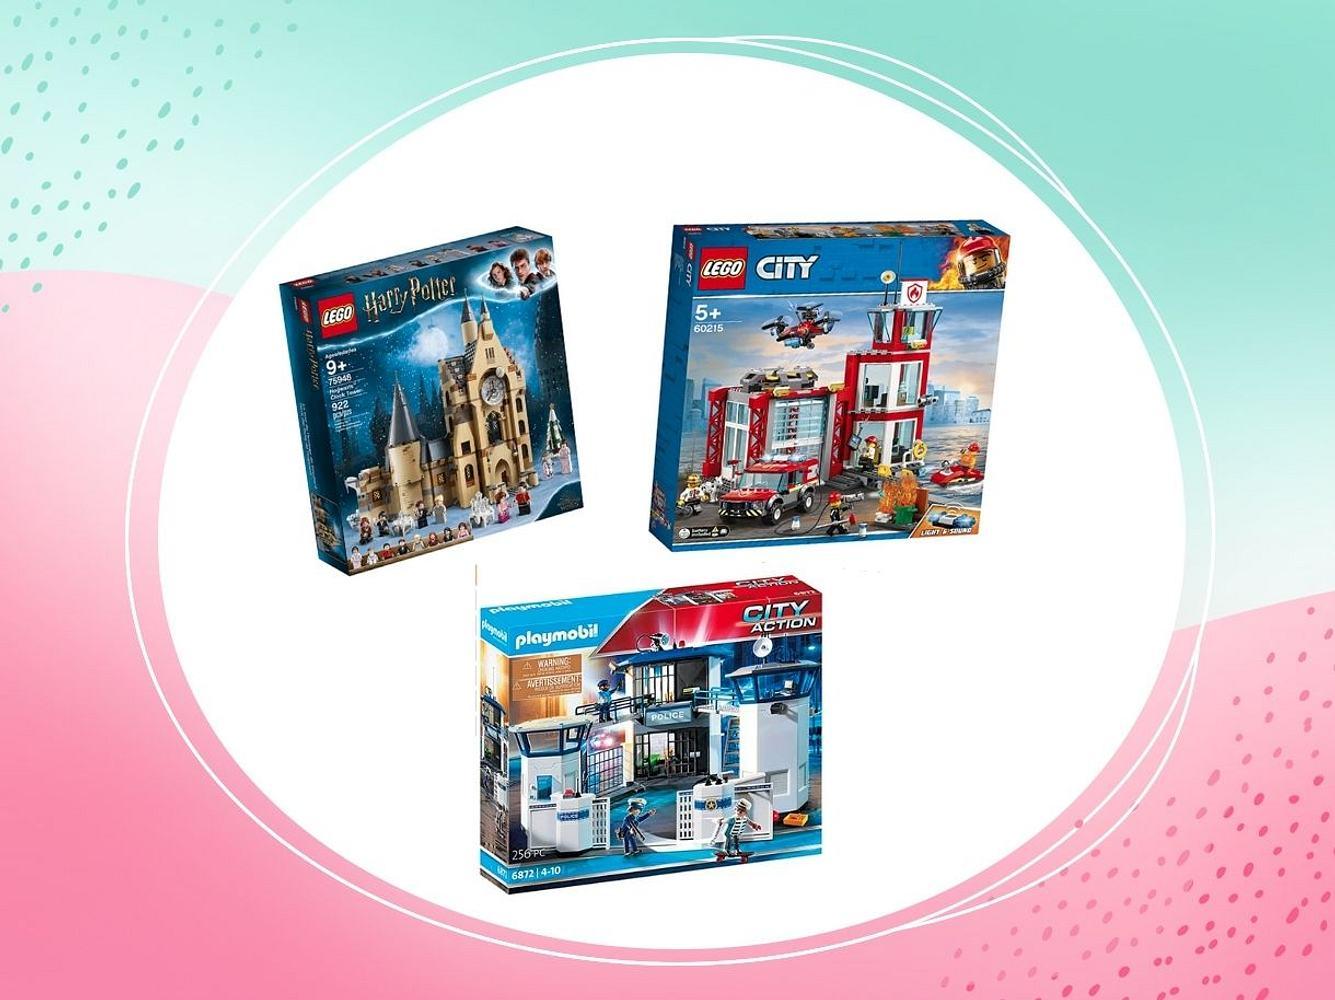 Prime Day Angebote Lego und Playmobil 2021